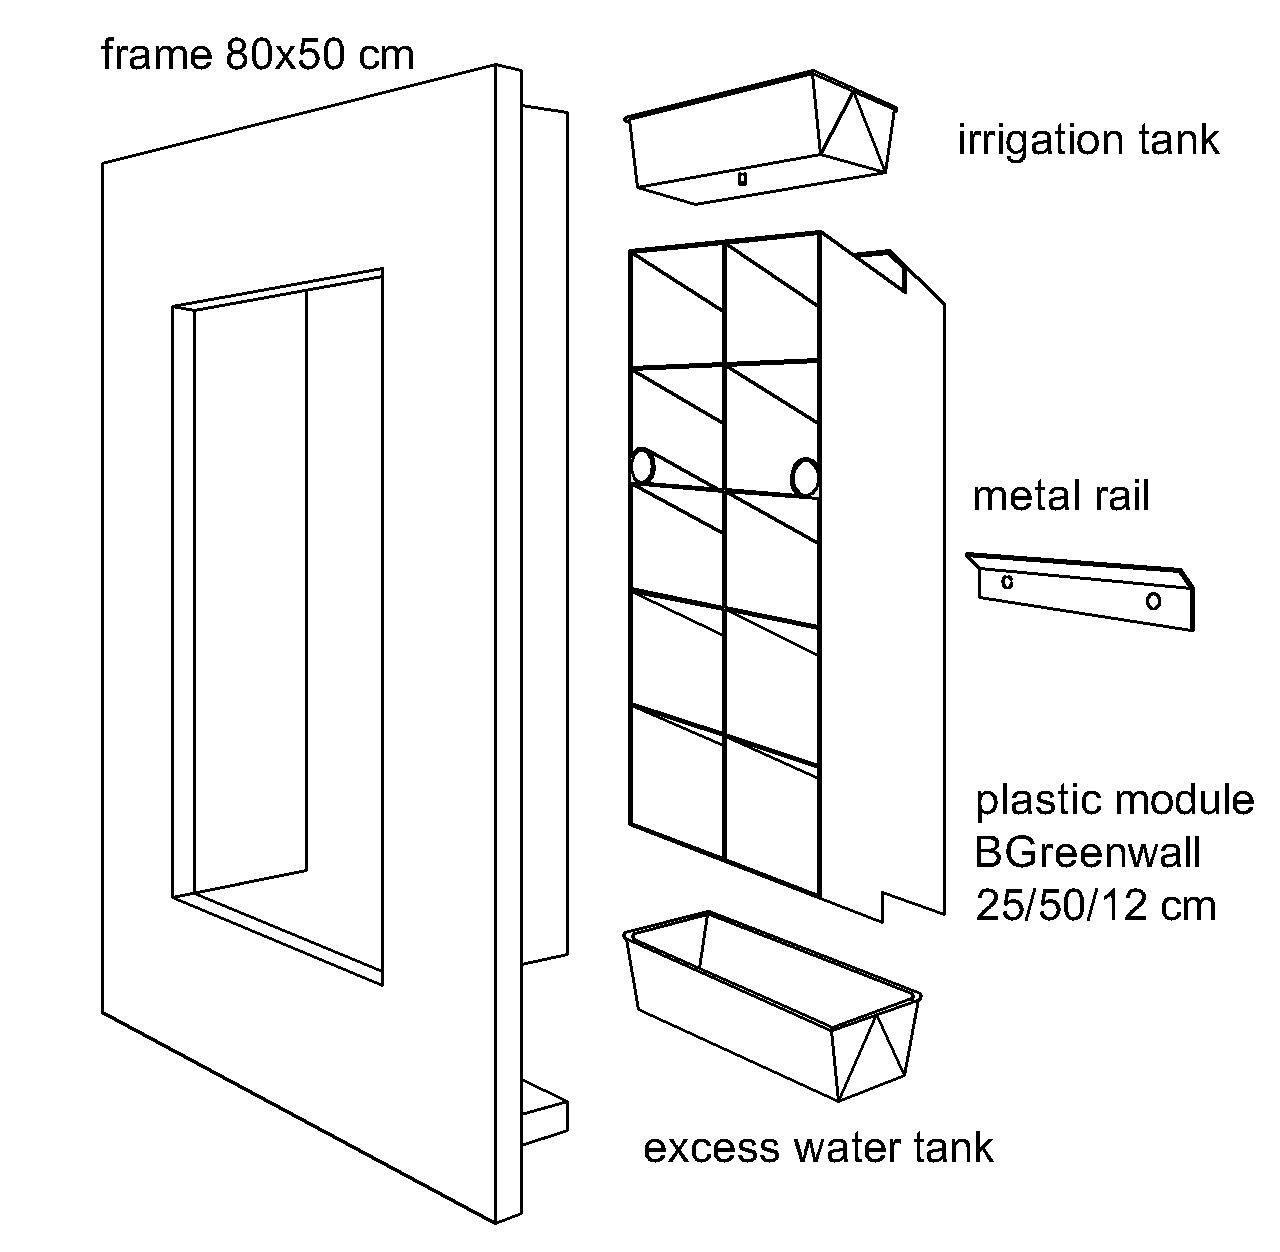 FrameGoGreen install kit drawing